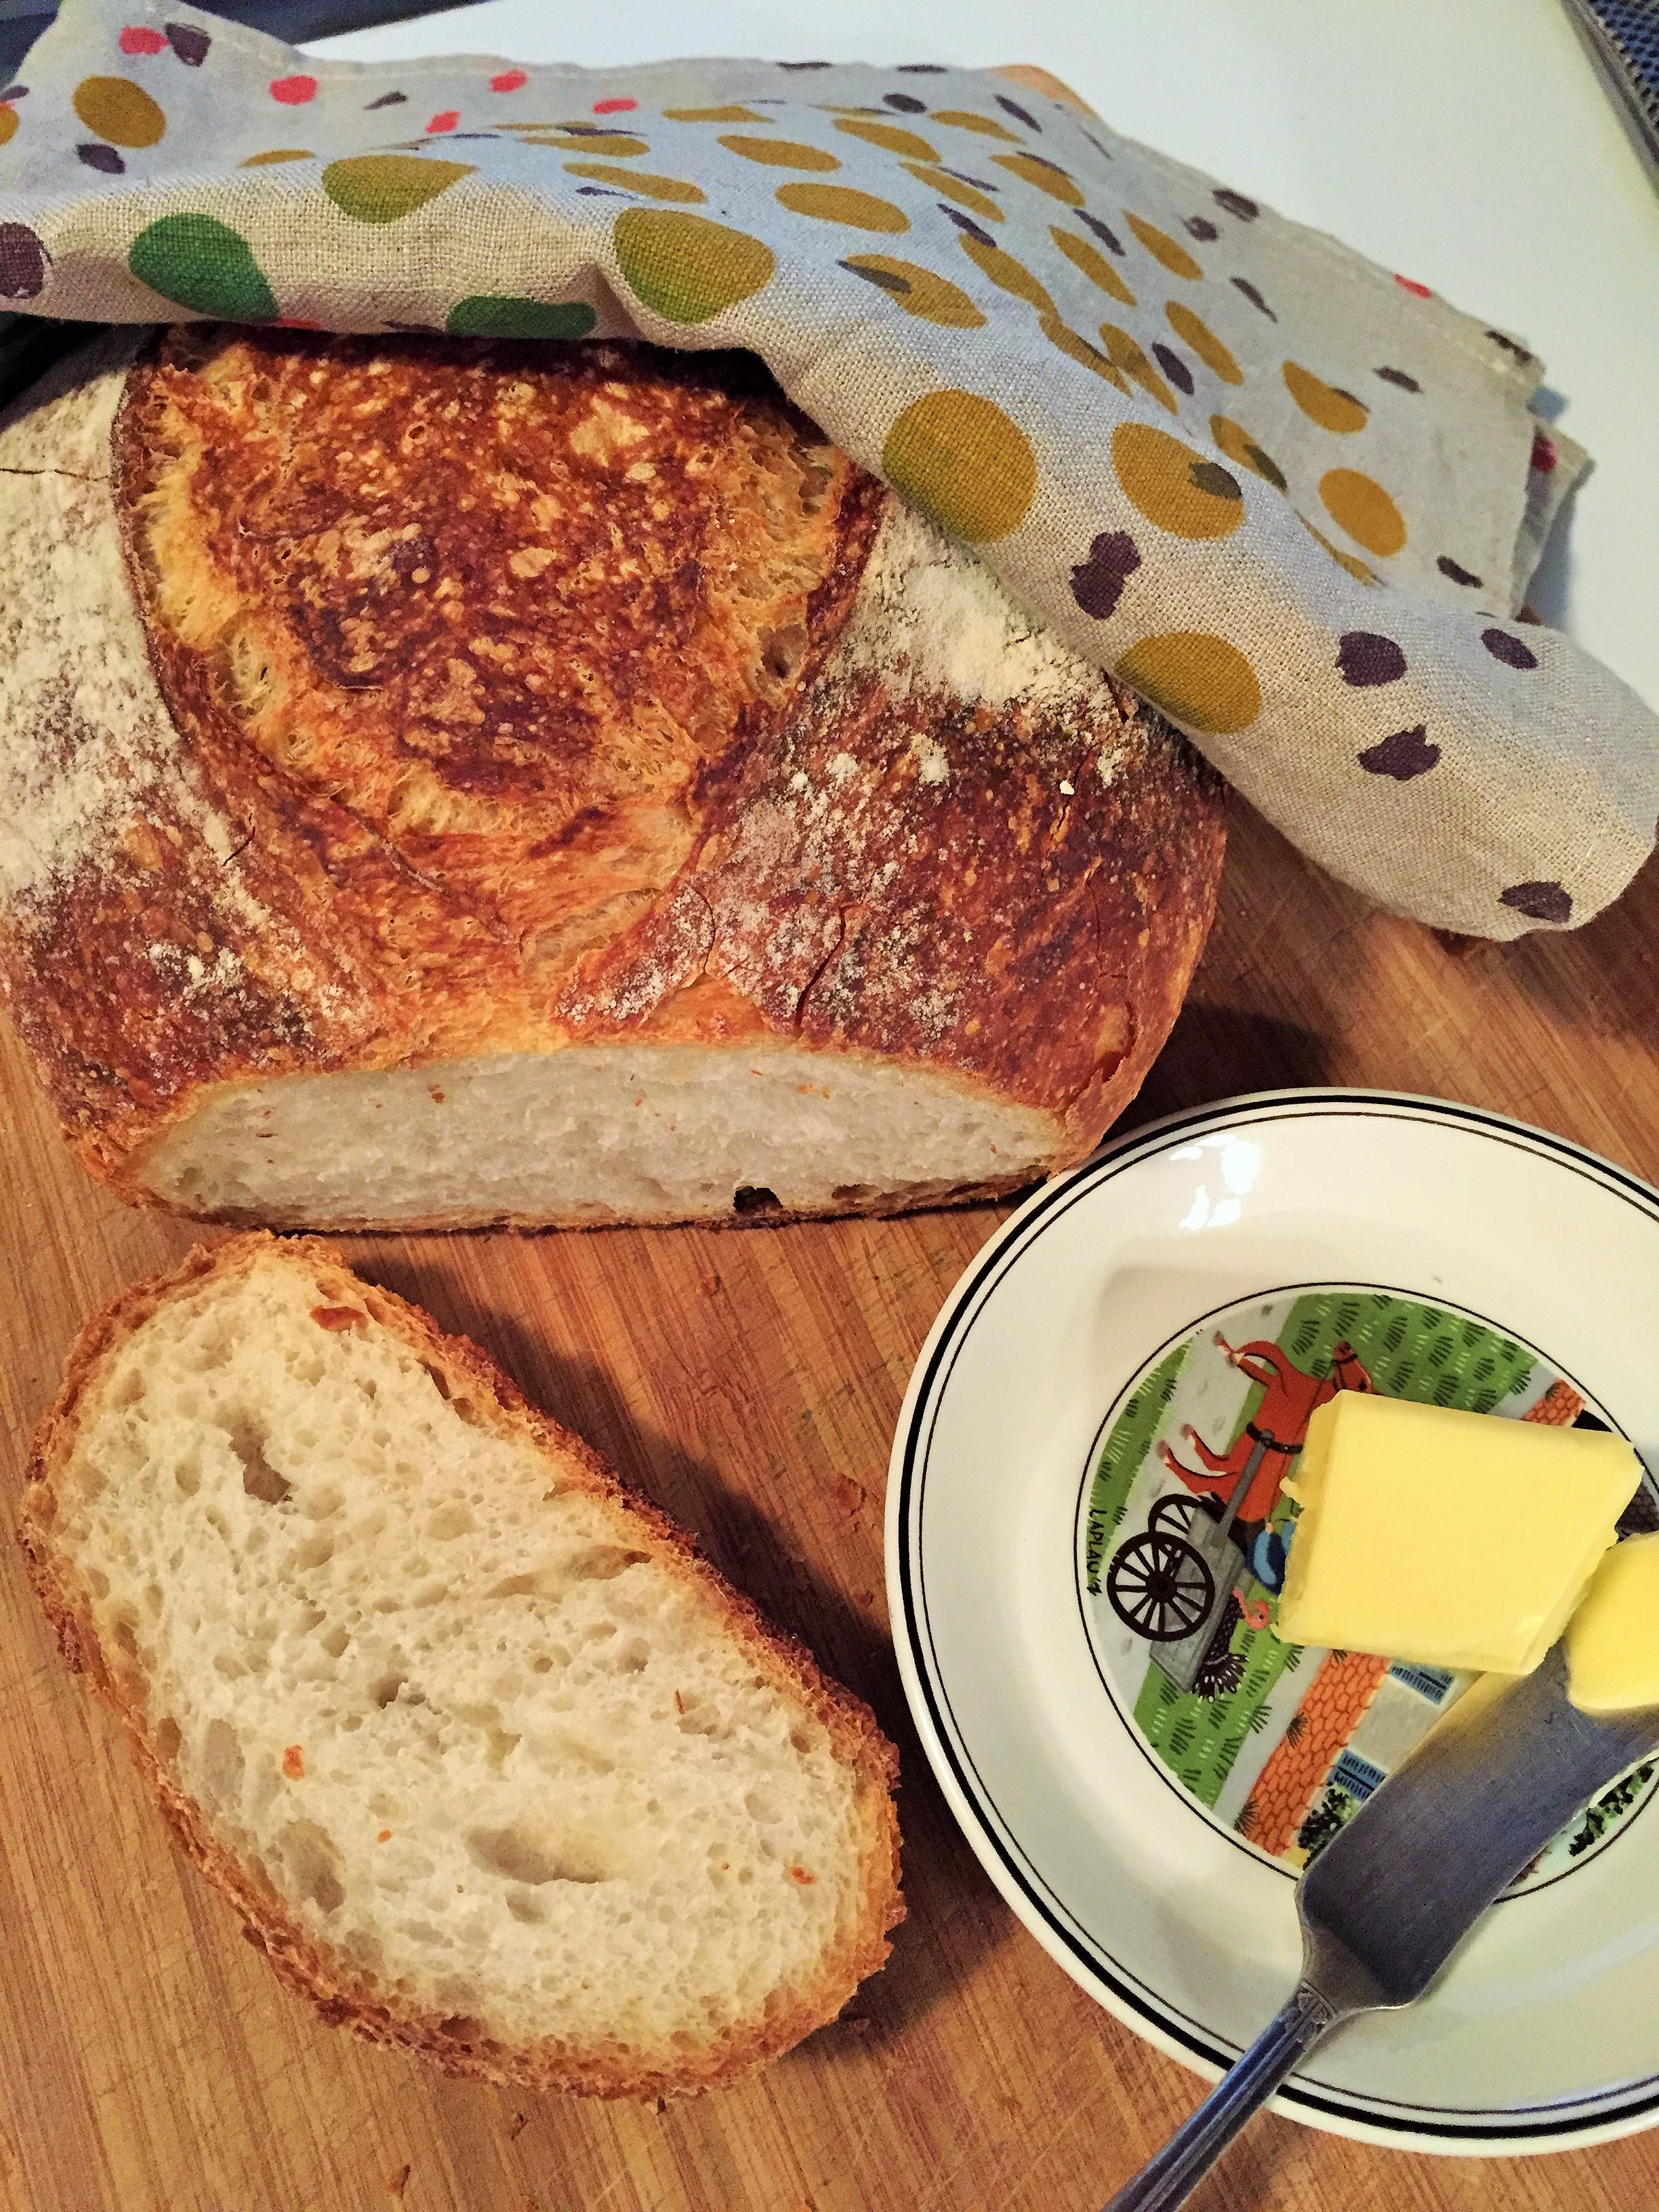 ATK (Almost) No Knead Bread 2.0